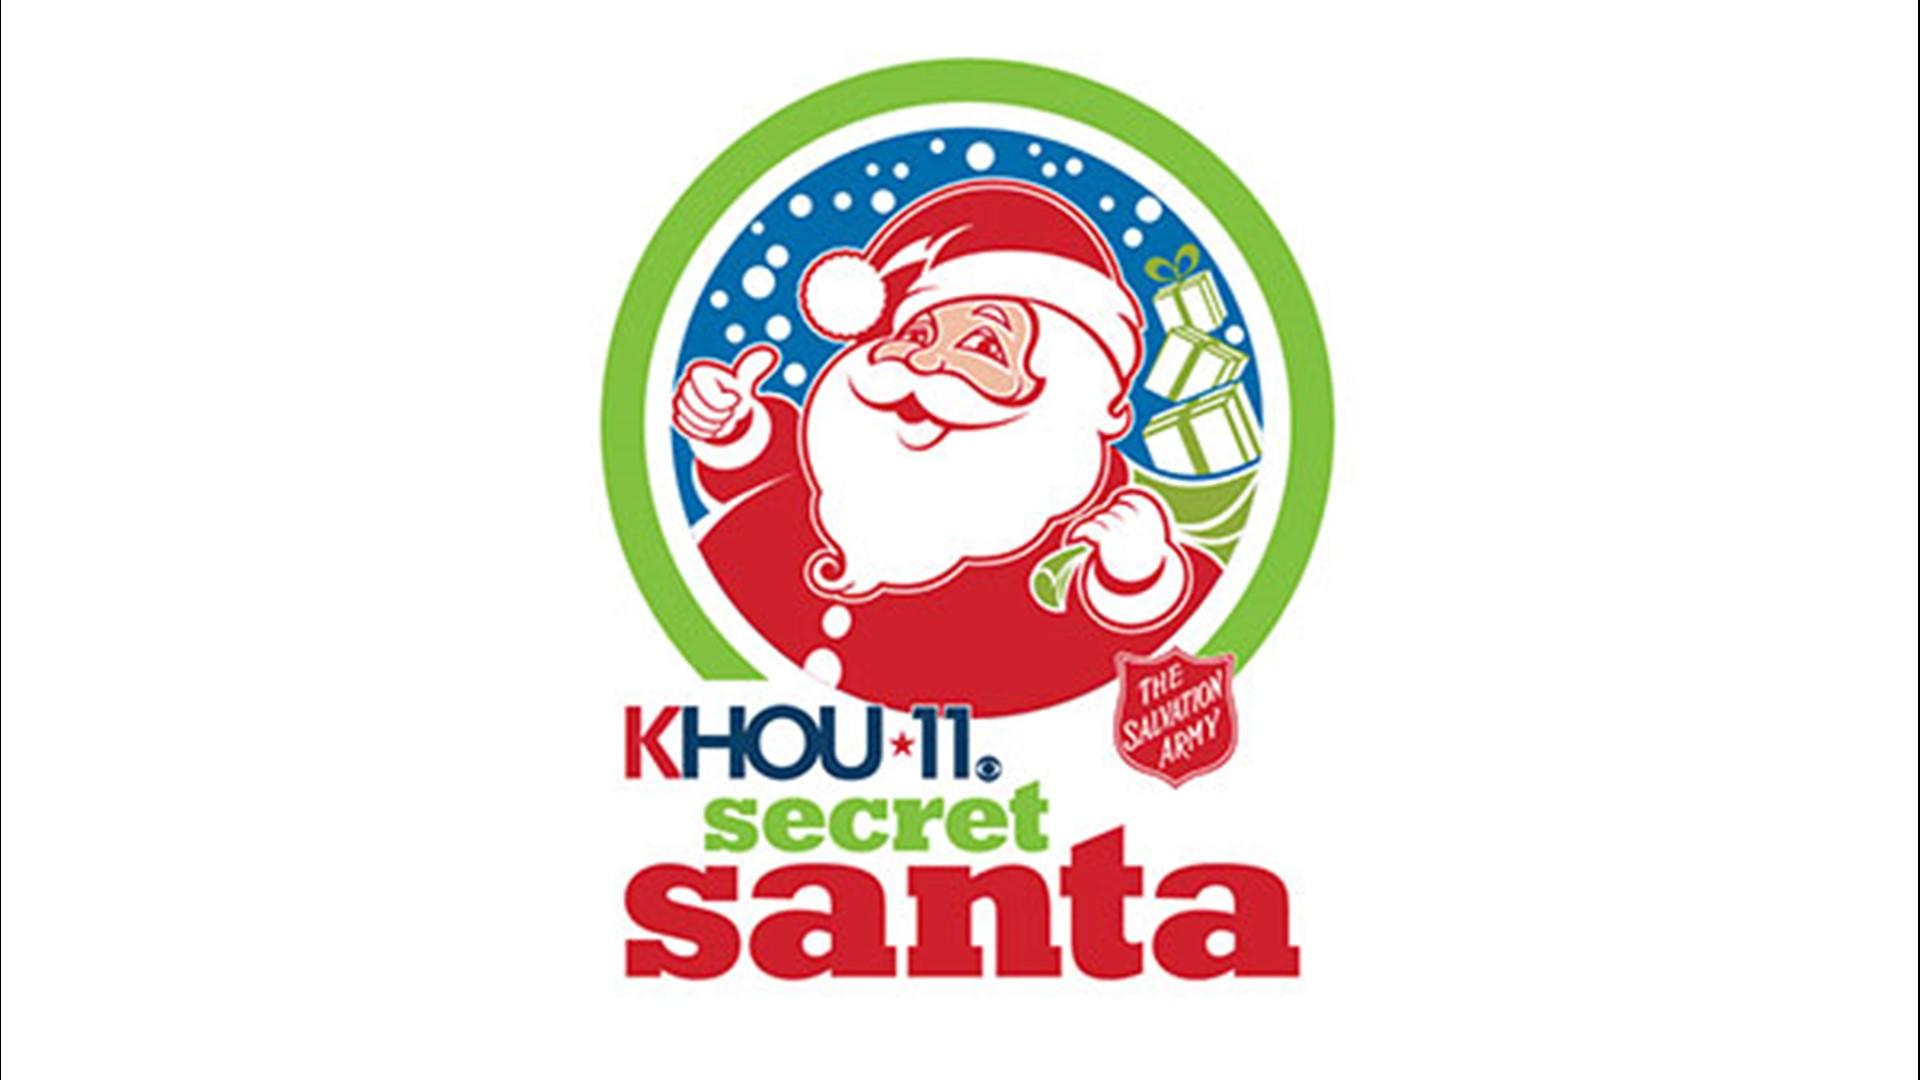 Multnomah County Christmas Toy Donations 2020 KHOU Secret Santa: Help make holidays a little brighter | kgw.com